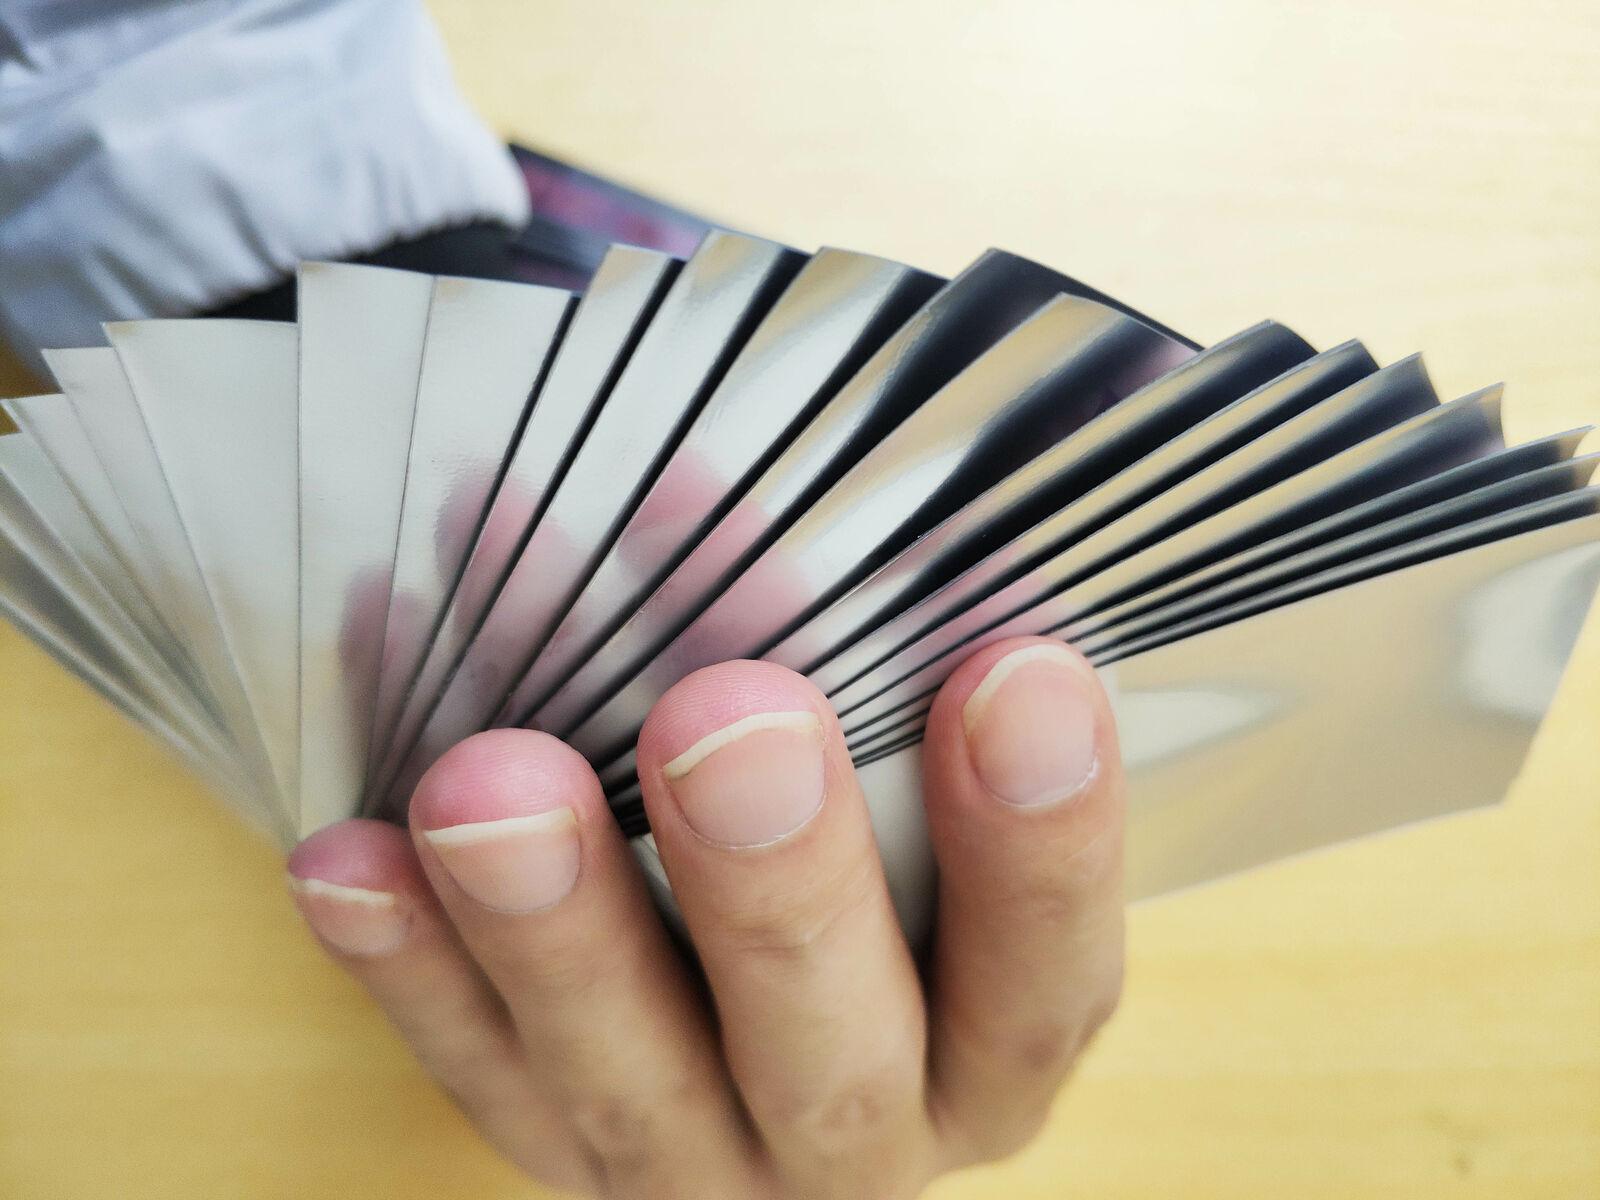 60/PCS Black Lotus Matt Scrub Colorful Backs MTG Cards